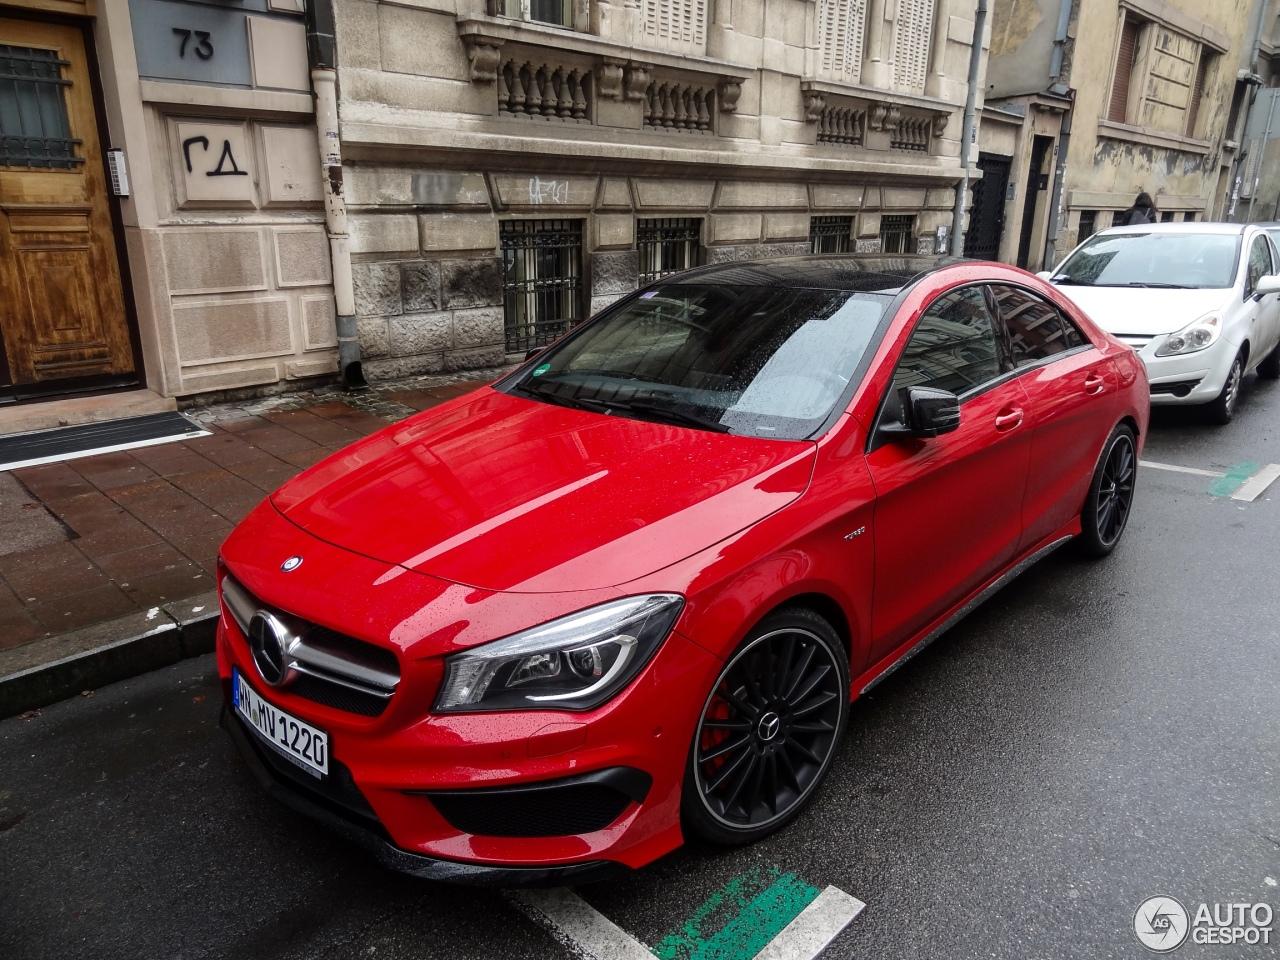 Mercedes-Benz CLA 45 AMG C117 - 19 January 2015 - Autogespot